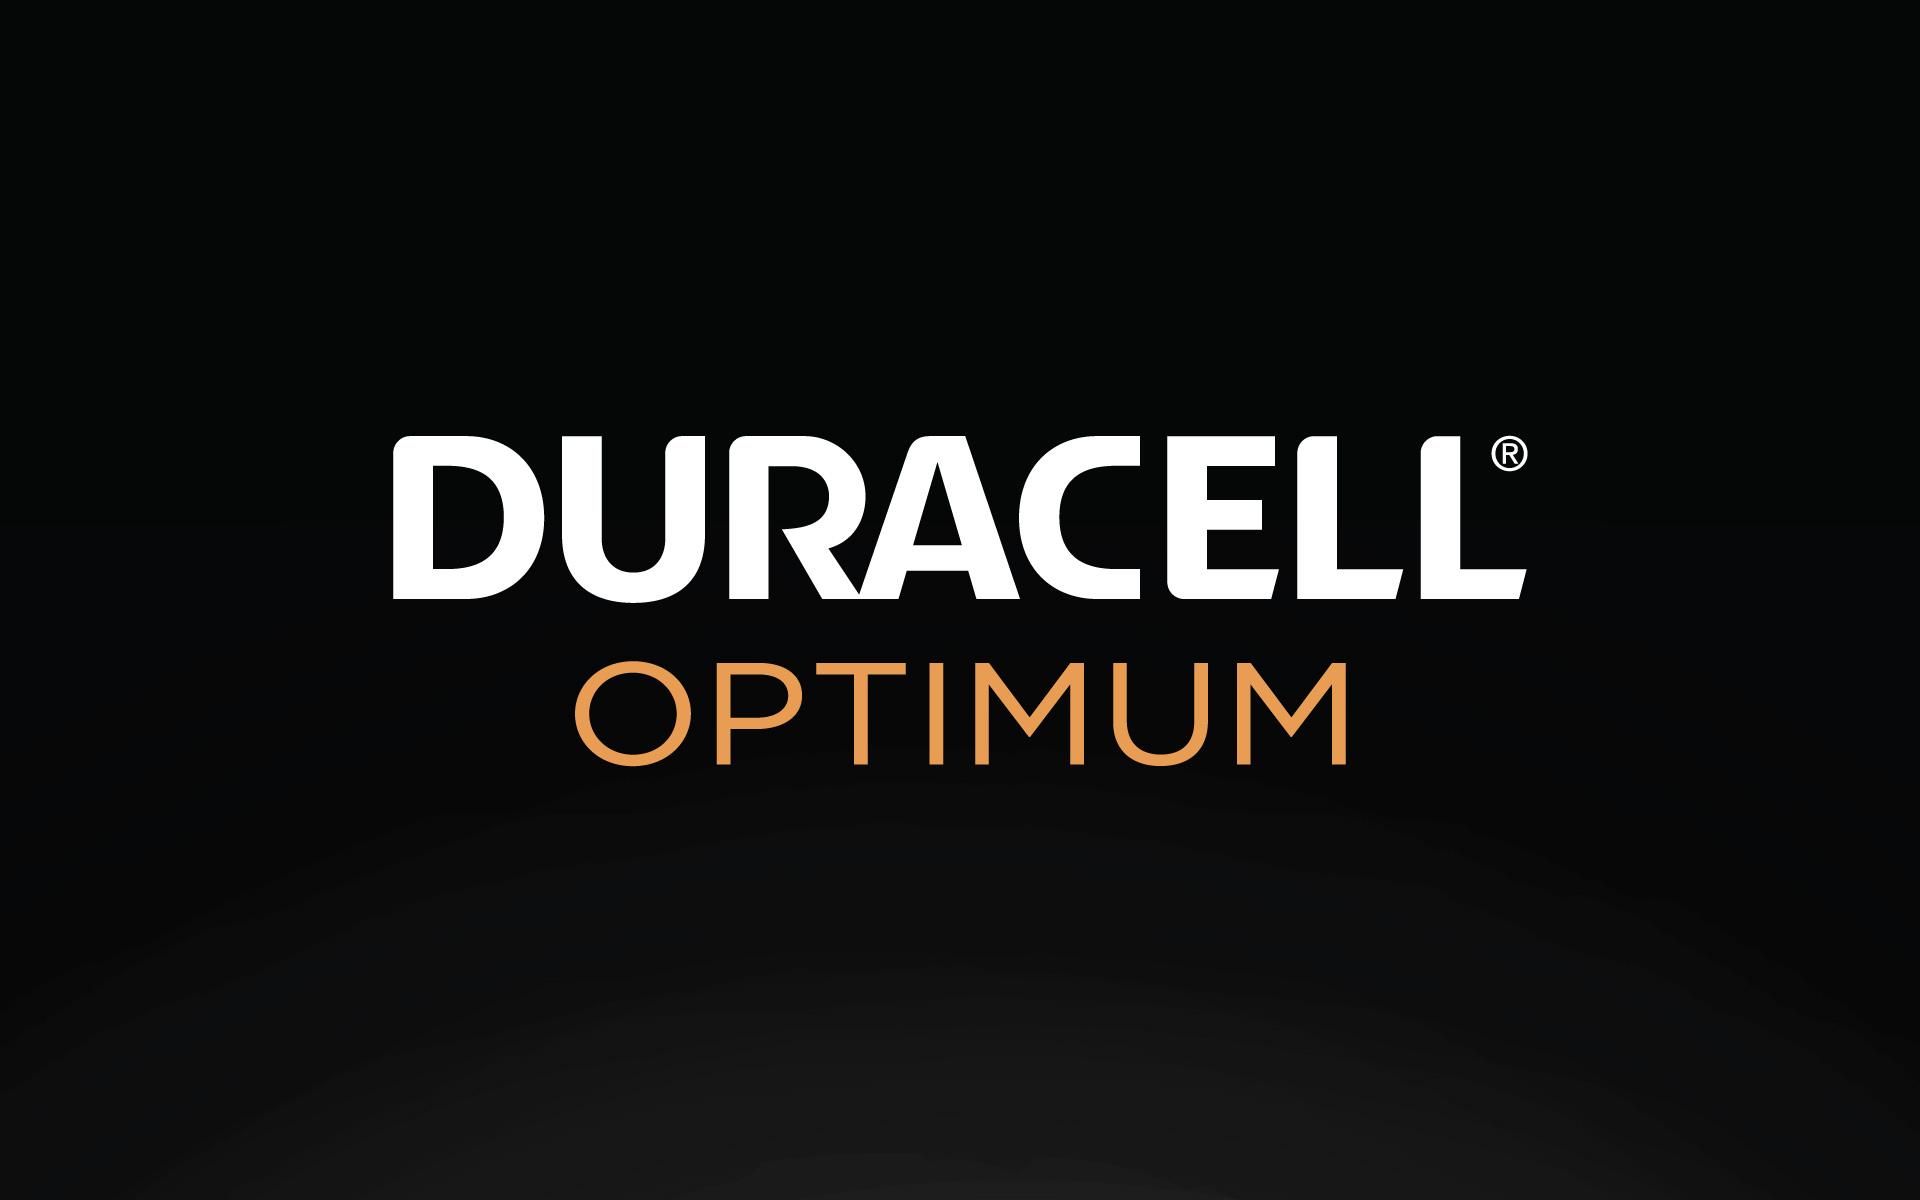 Duracell Optimum  - Brand Identity